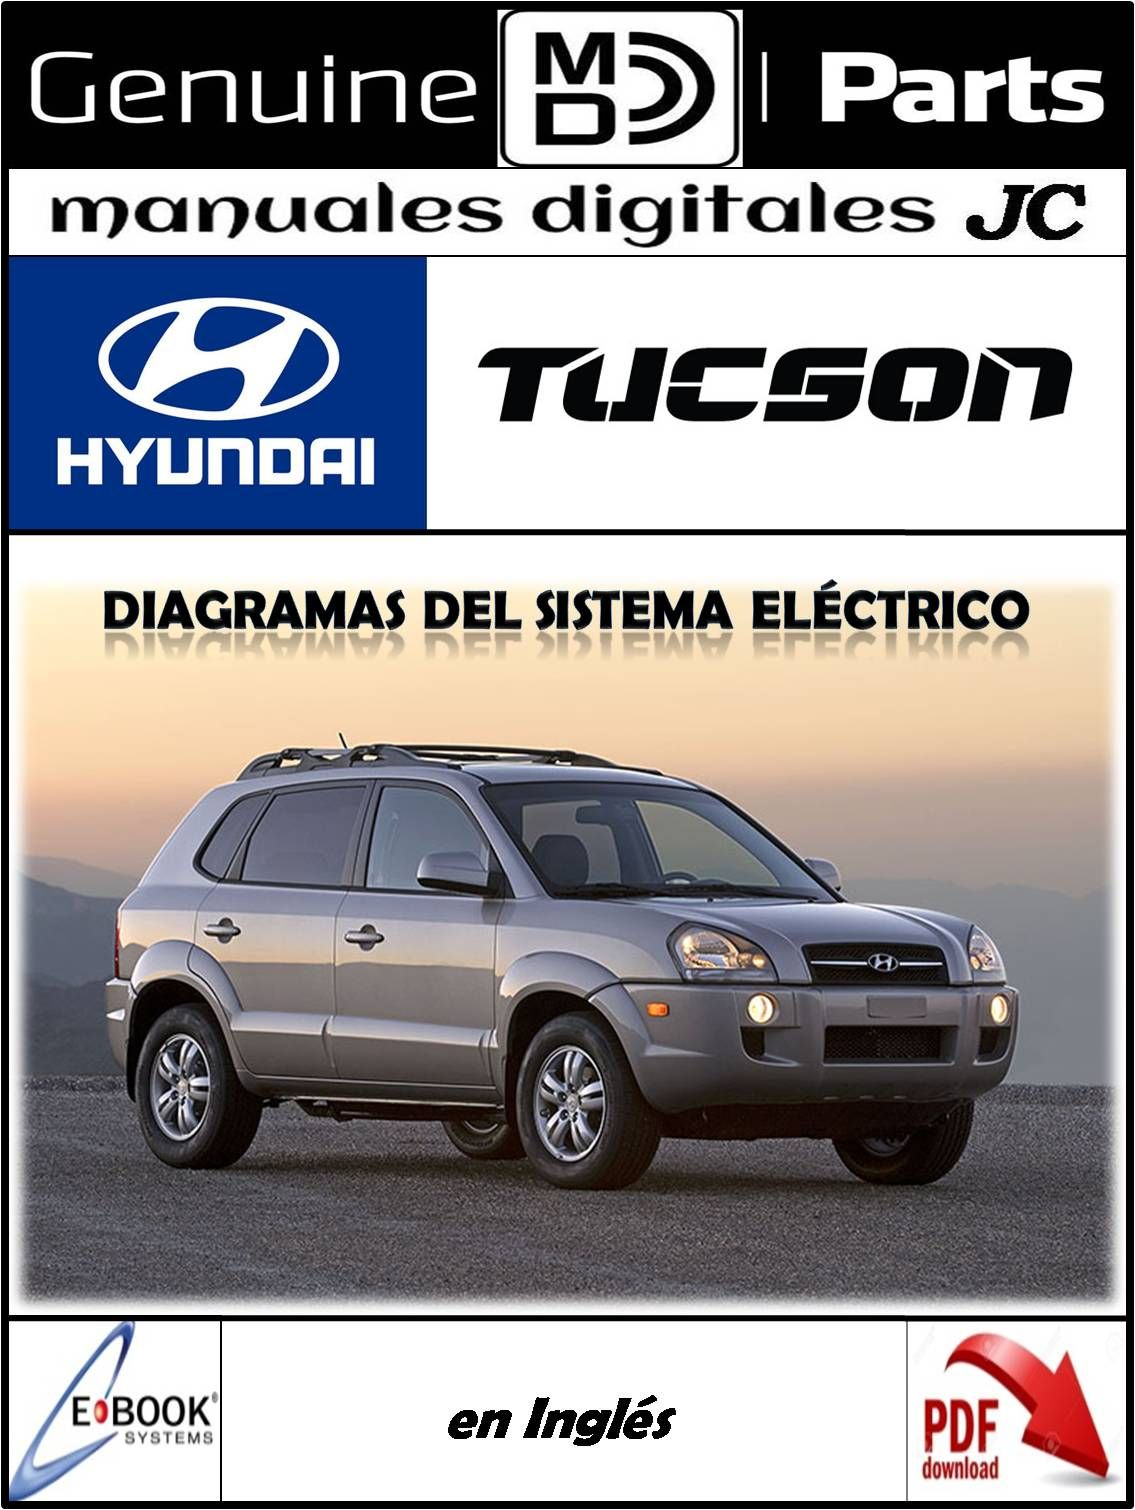 Manual Diagramas Del Sistema Electrico Para Hyundai Tucson Correo Manualesdigitalesjc Gmail Com Tlfs 58 424 858 47 28 Pagina Facebook Tucson Hyundai Suv Car